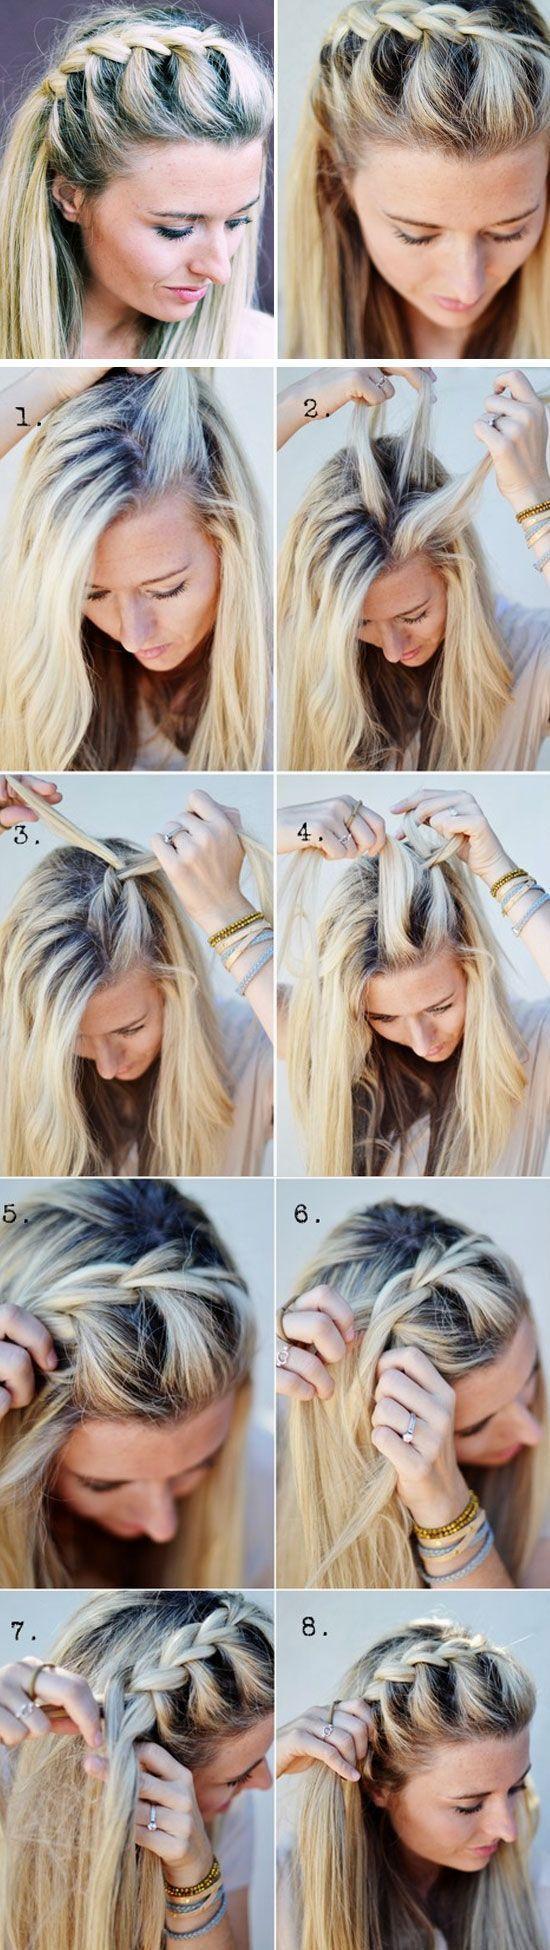 23 Easy Fall Hairstyles for Medium Hair